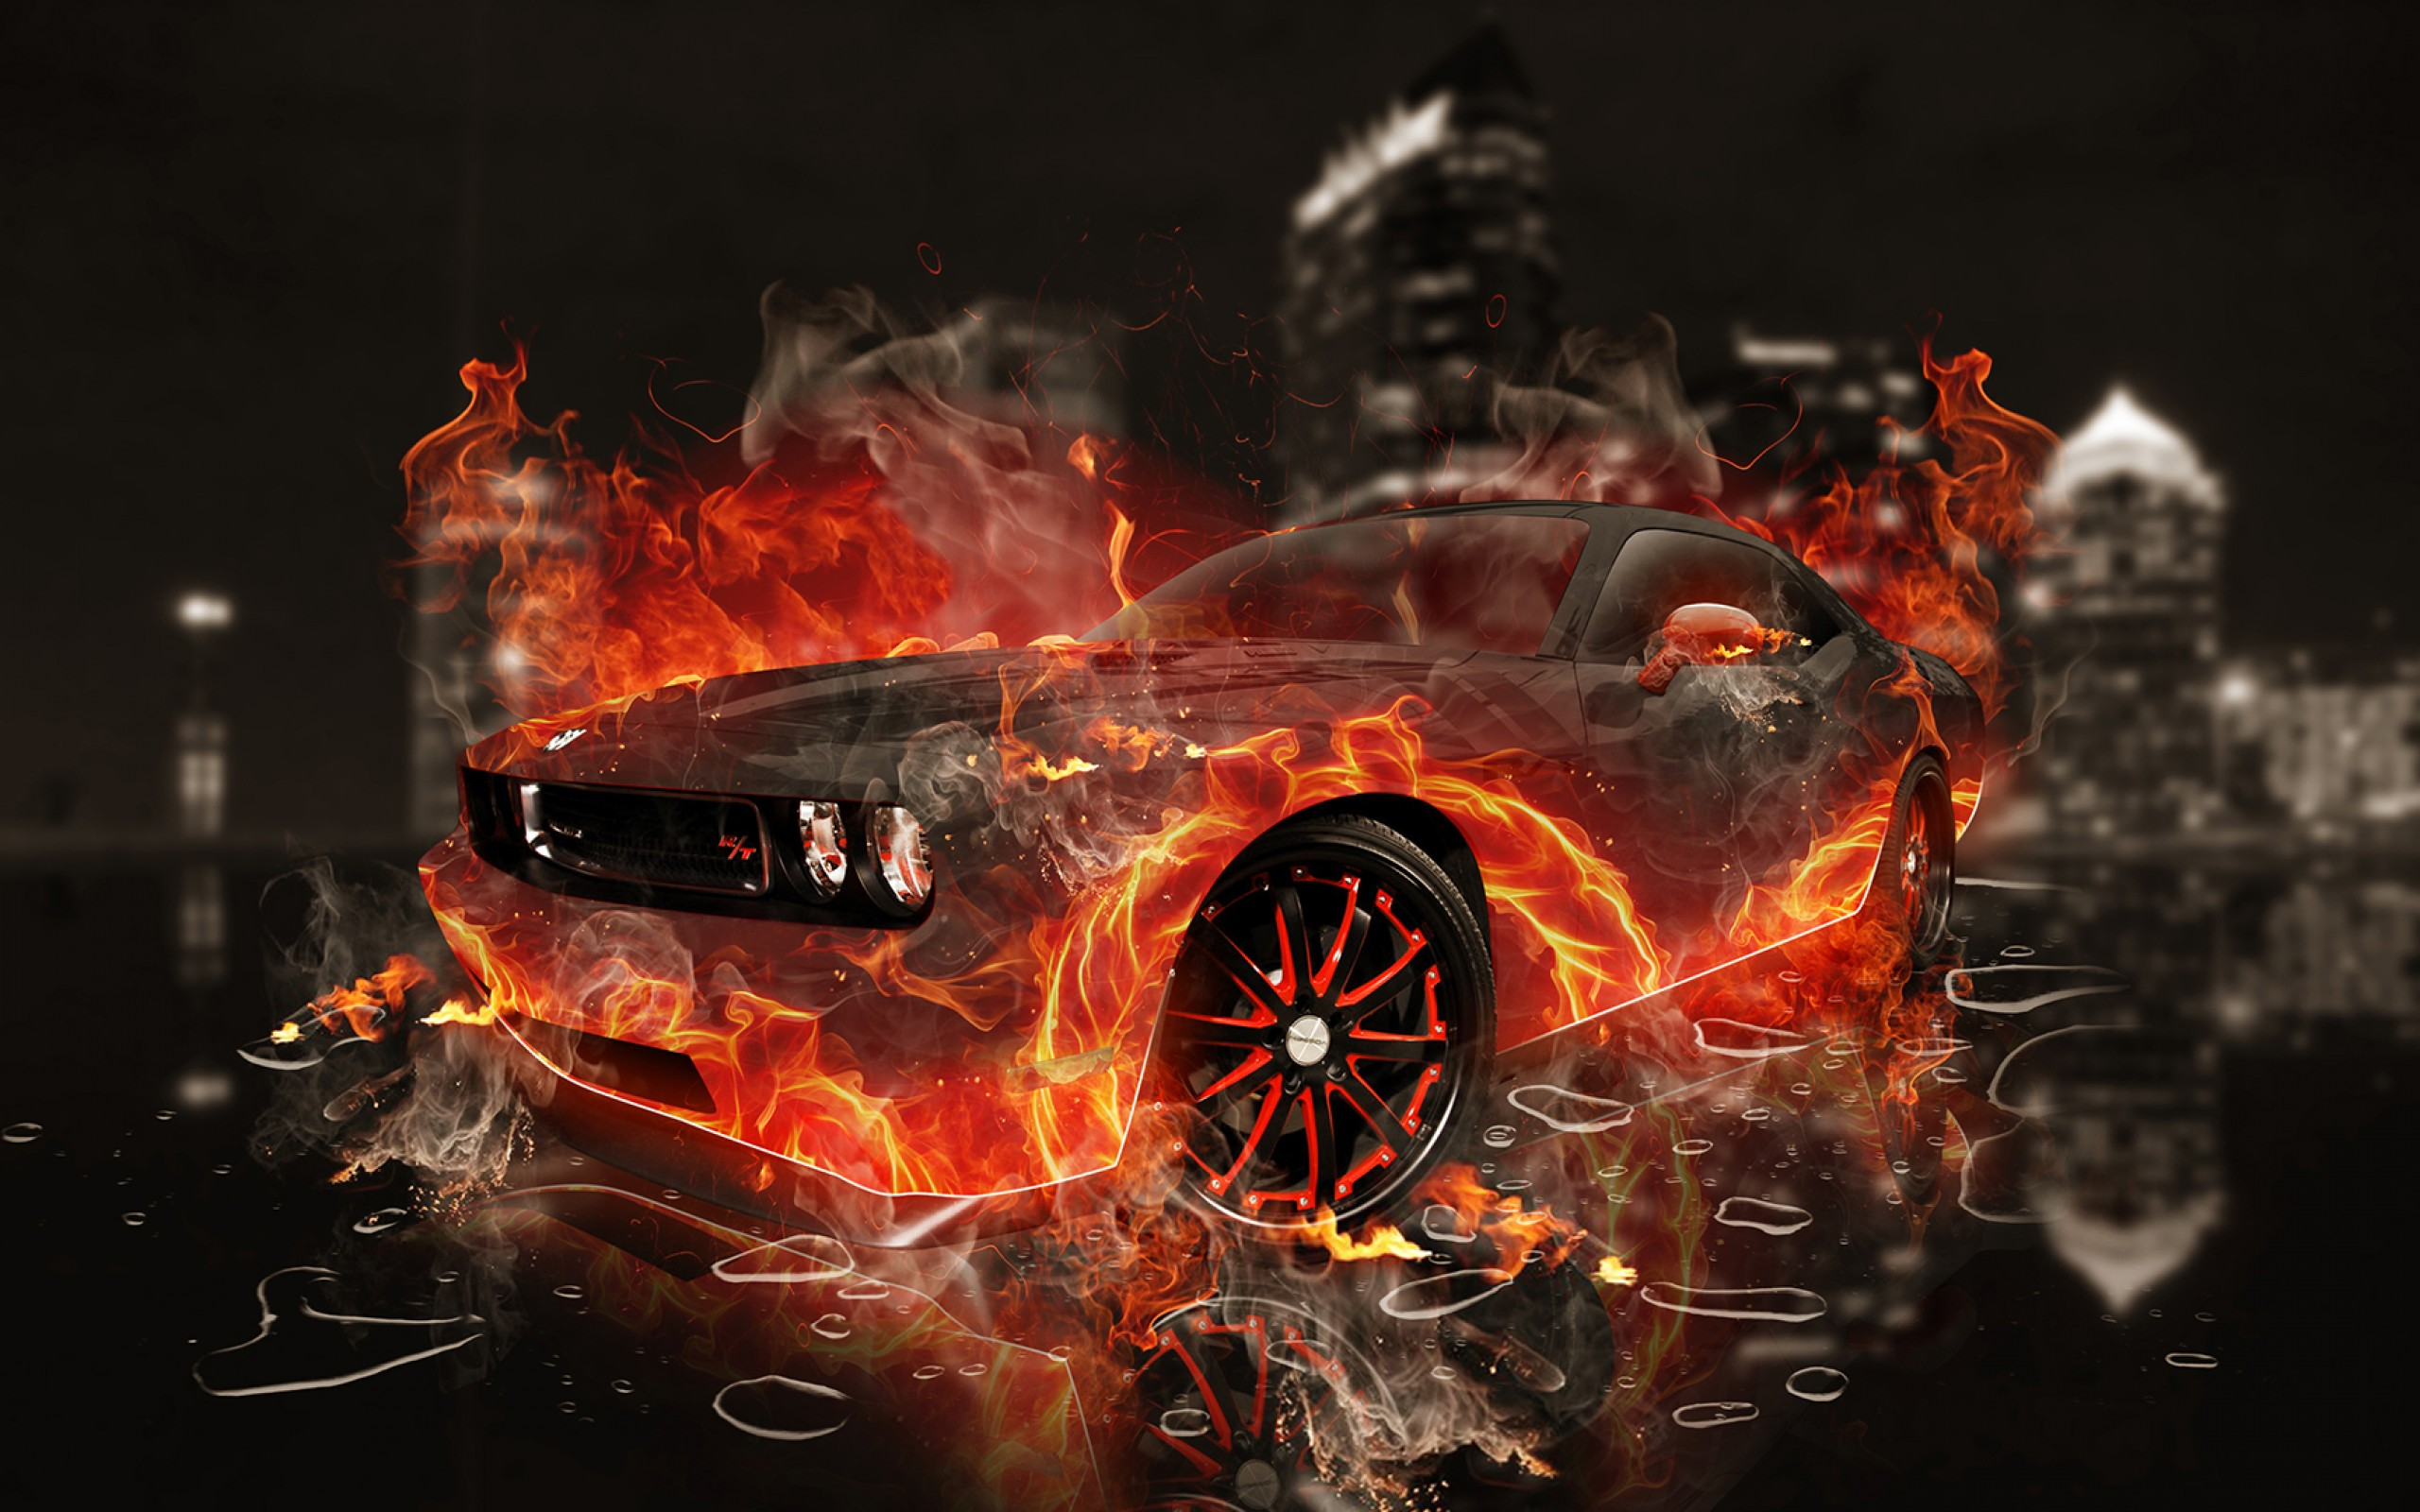 Car Wallpapers For Fire Fire Car 2107296 Hd Wallpaper